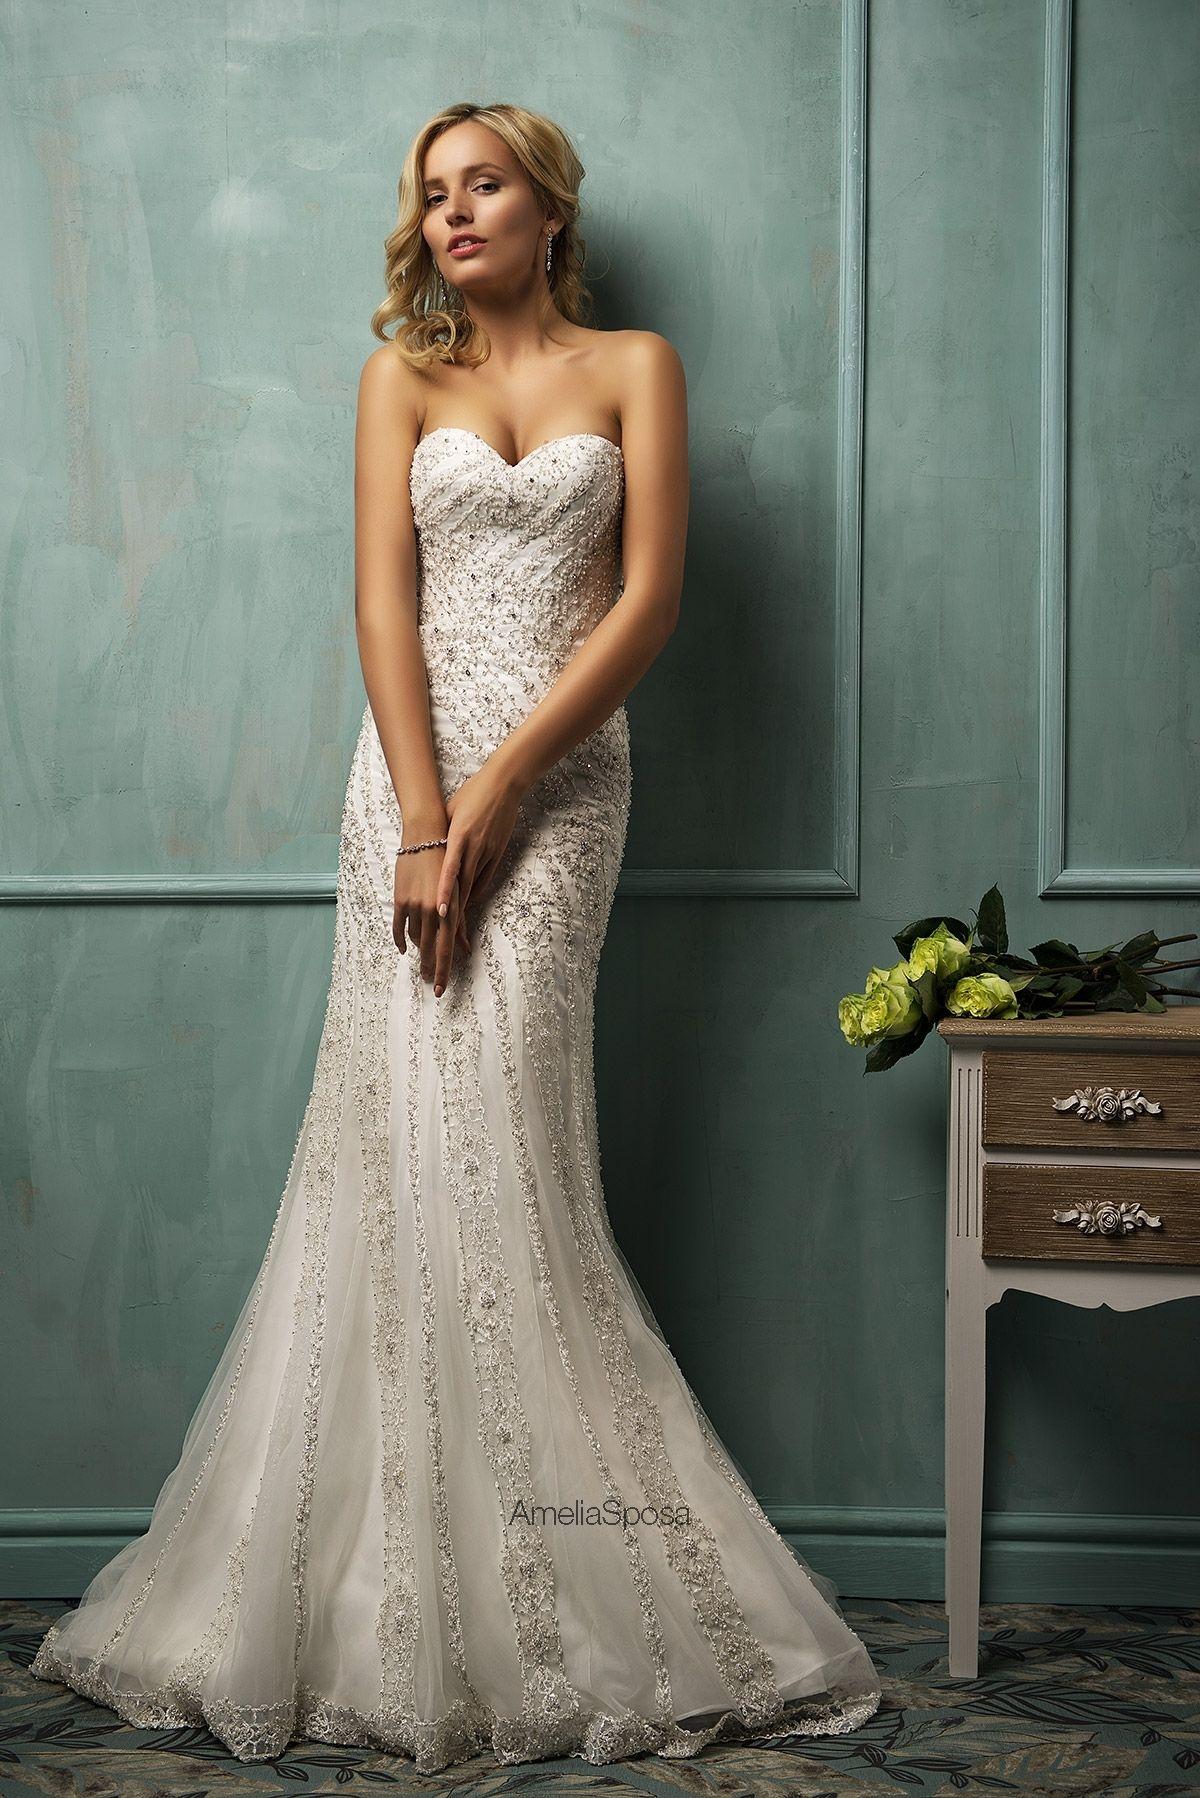 Best vintage wedding dress designers  The Best Gowns from The Most InDemand Wedding Dress Designers